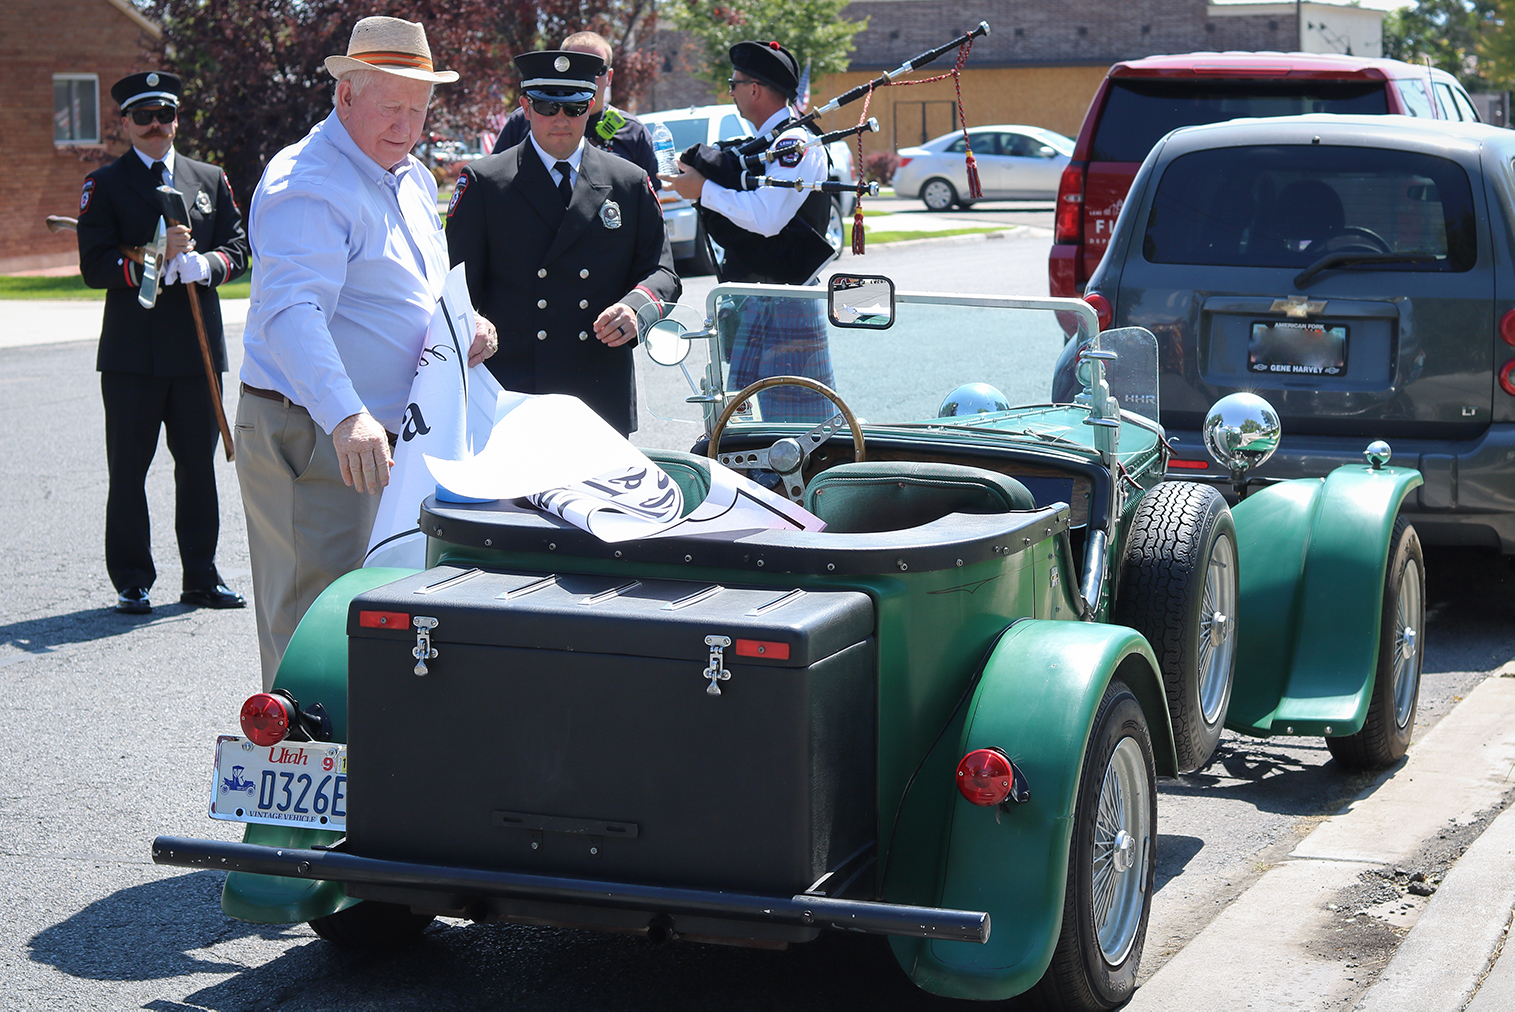 WK-pic1 Heritage Days Parade – Mayor Bert Wilson prepares his car for the parade (1)